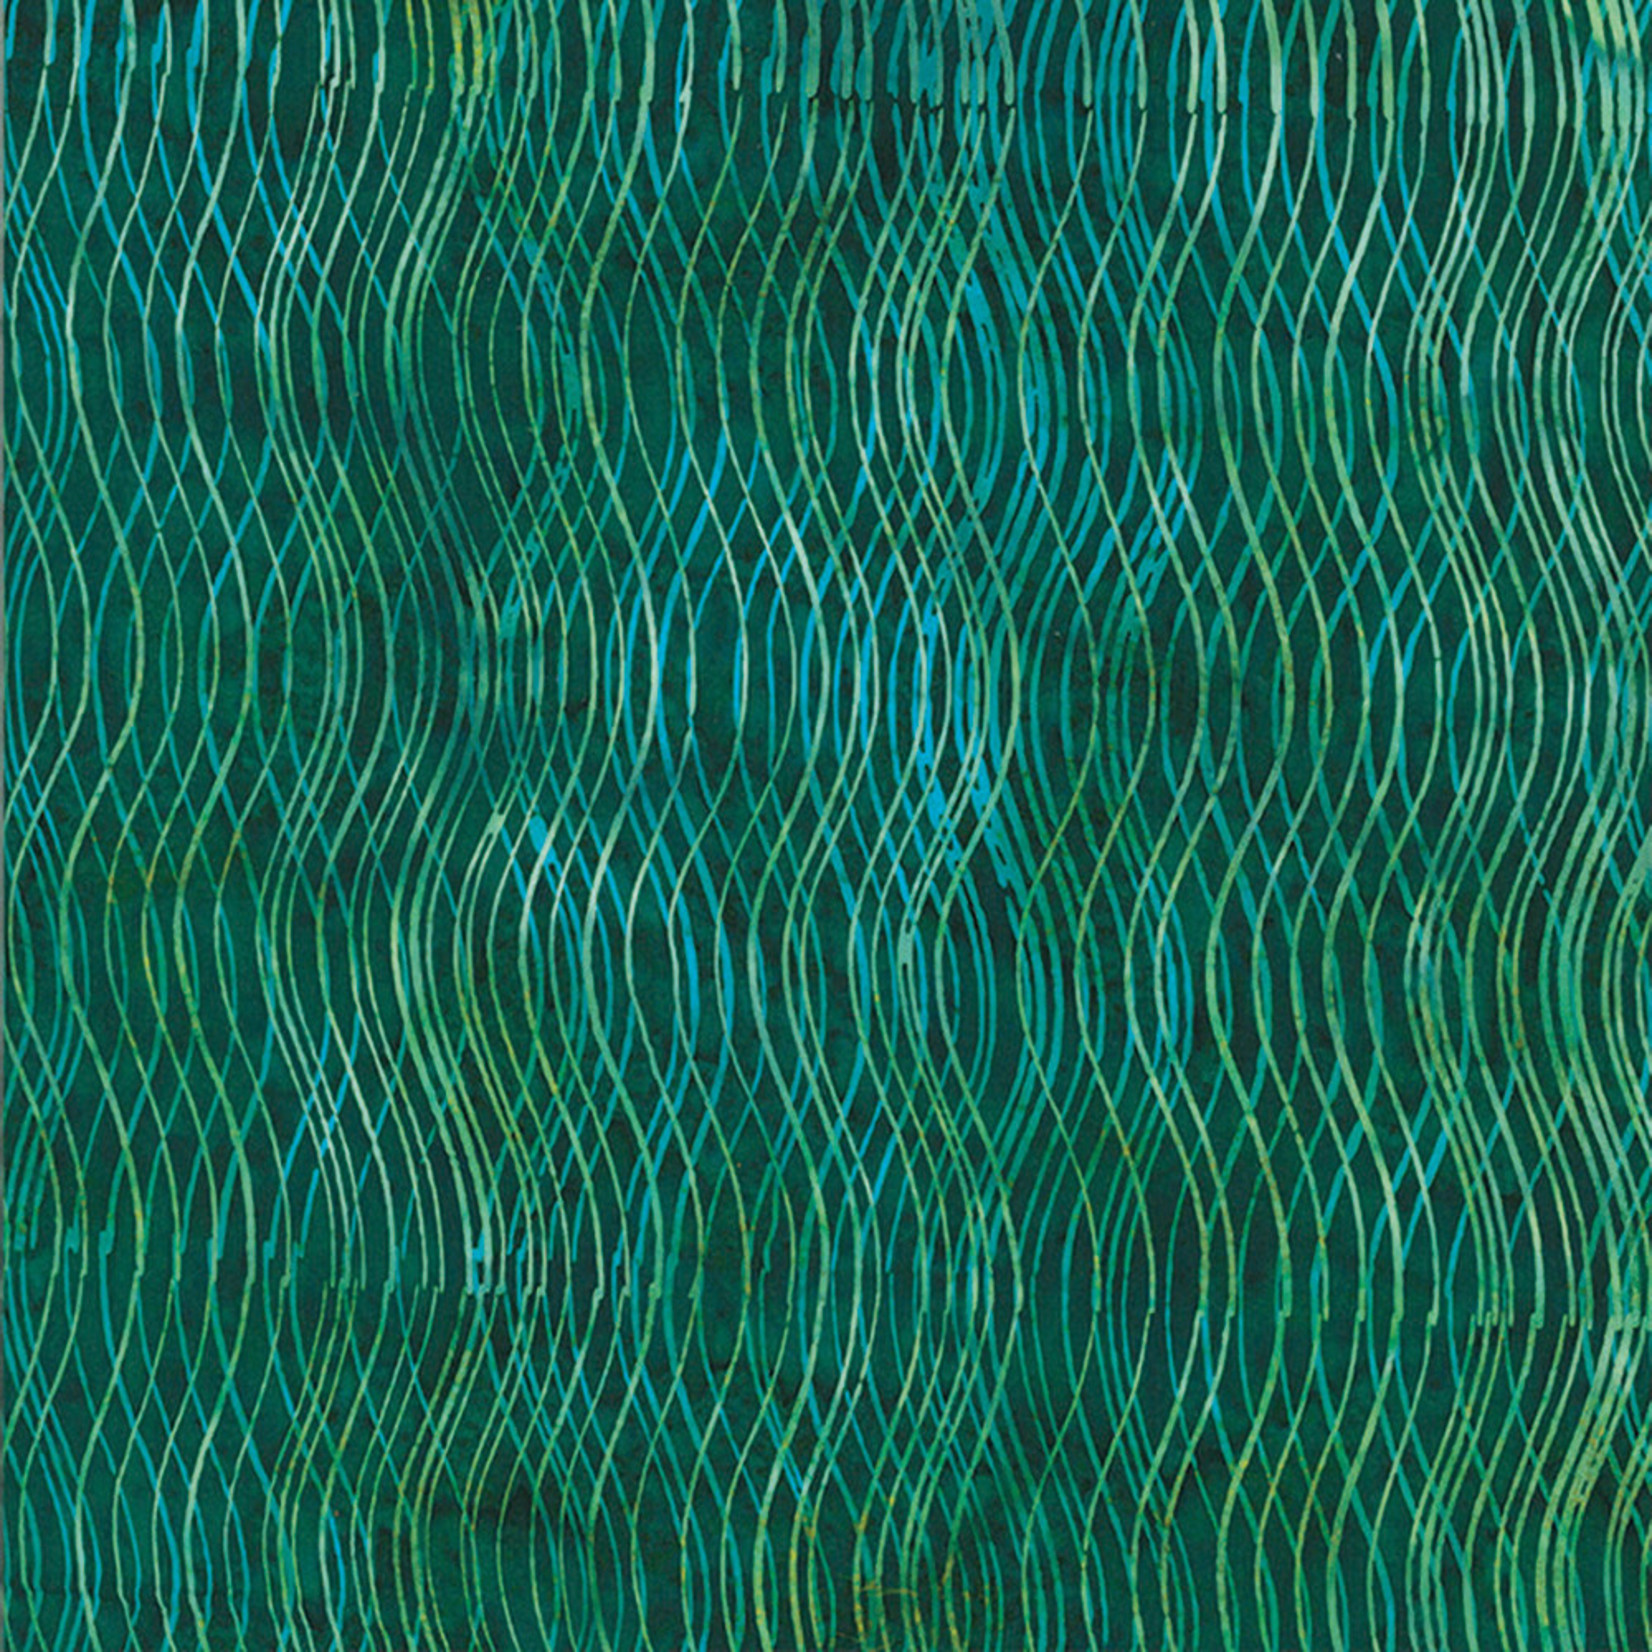 Hoffman Fabrics Bali Batik Wave - Emerald